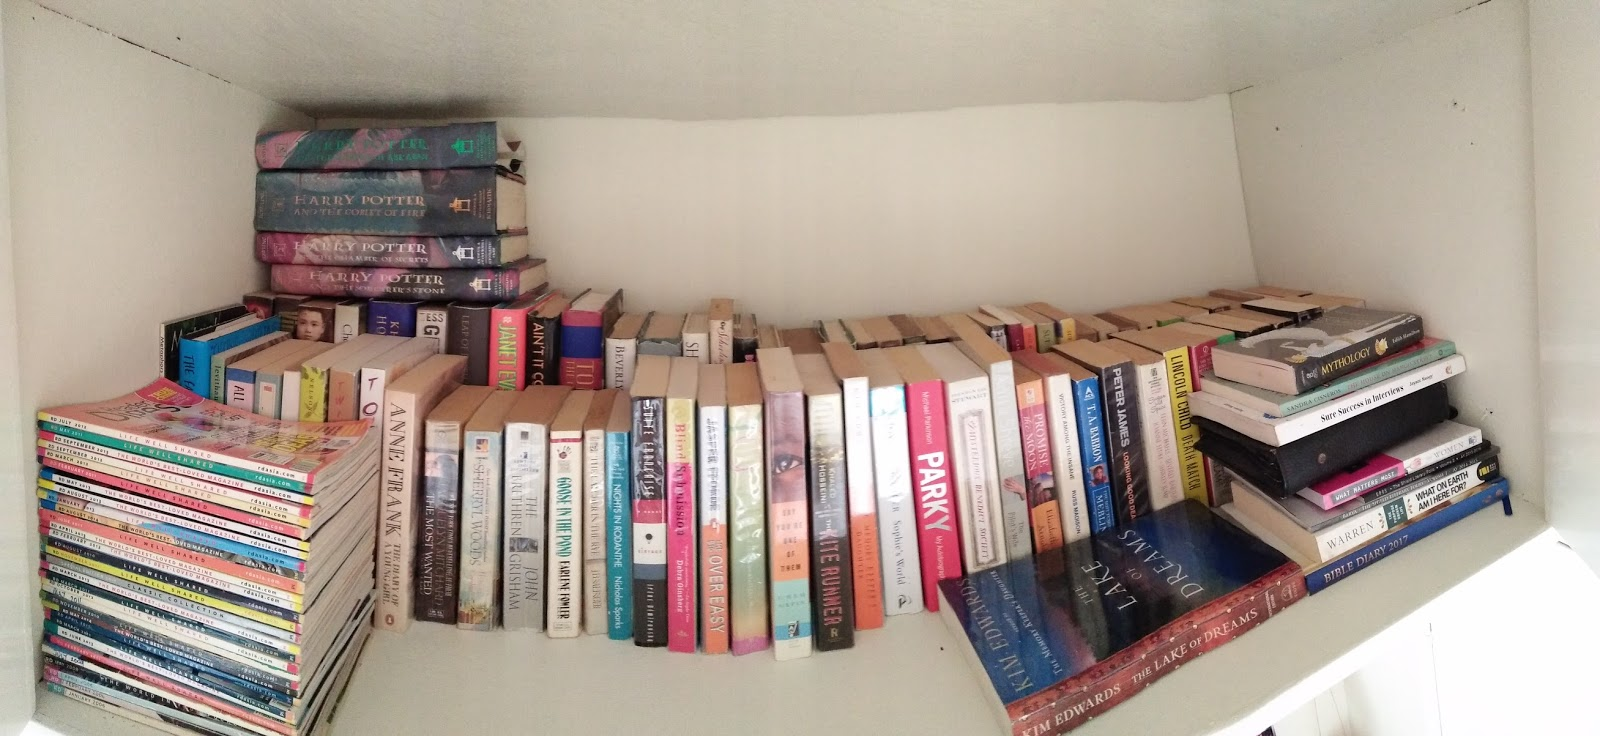 My books - Life of Ra 01